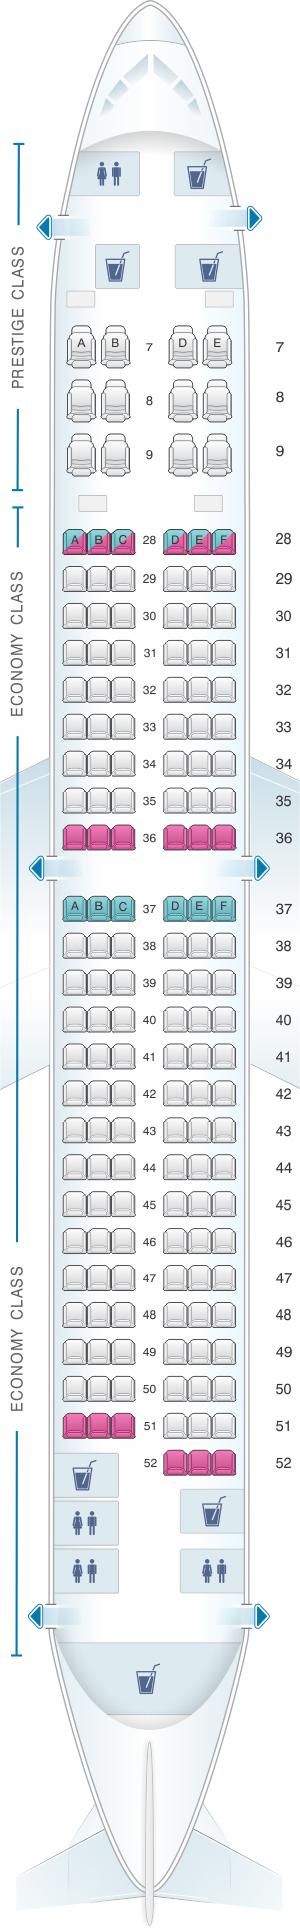 Seat map for Korean Air Boeing B737 900ER 159PAX